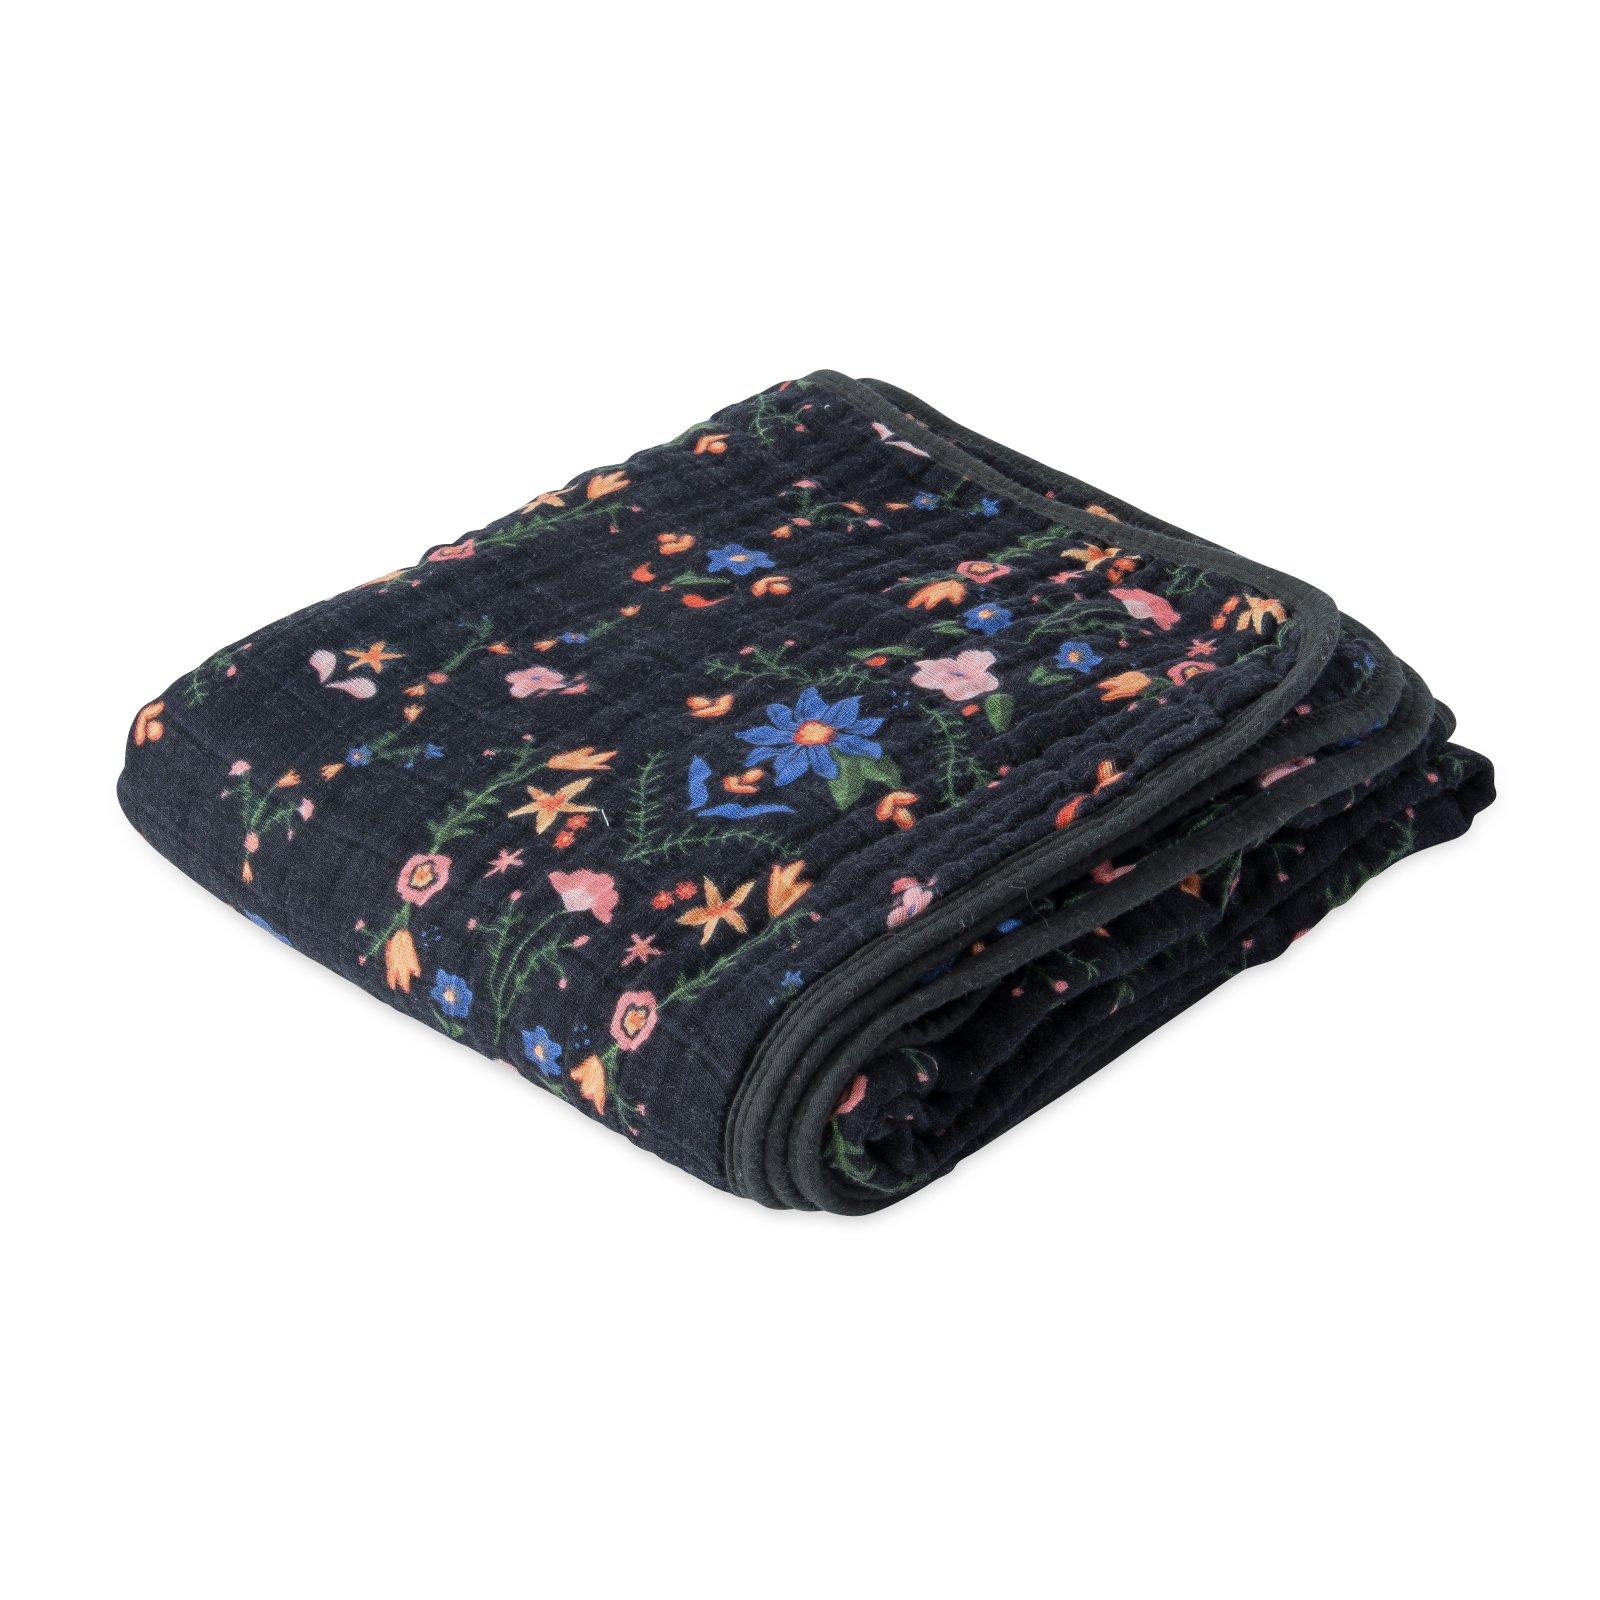 Little Unicorn Cotton Muslin Quilt - Floral Stitch